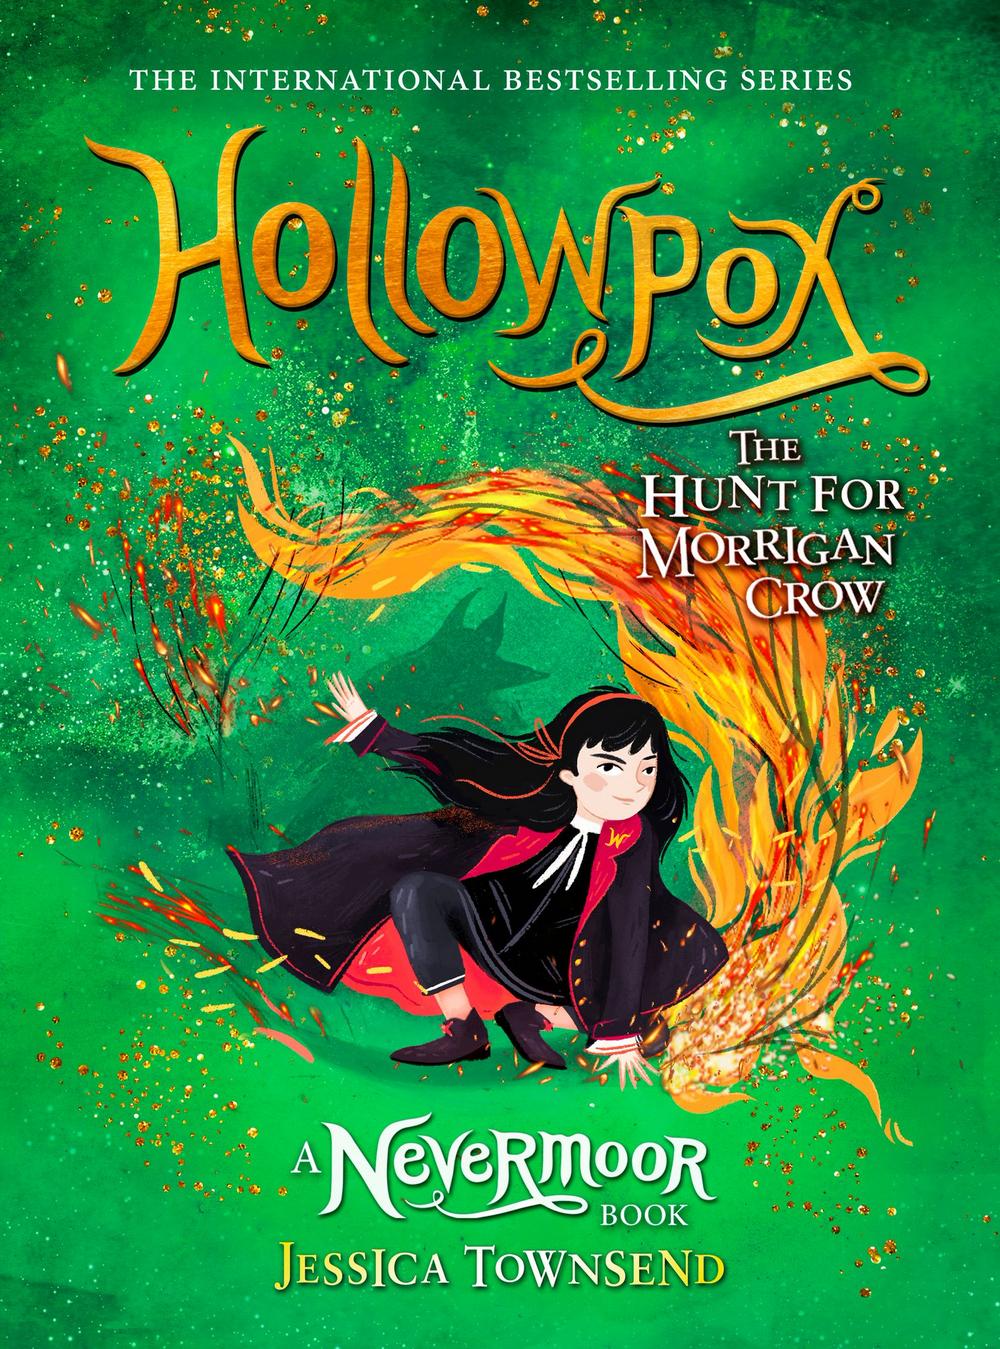 Hollowpox: The Hunt for Morrigan Crow